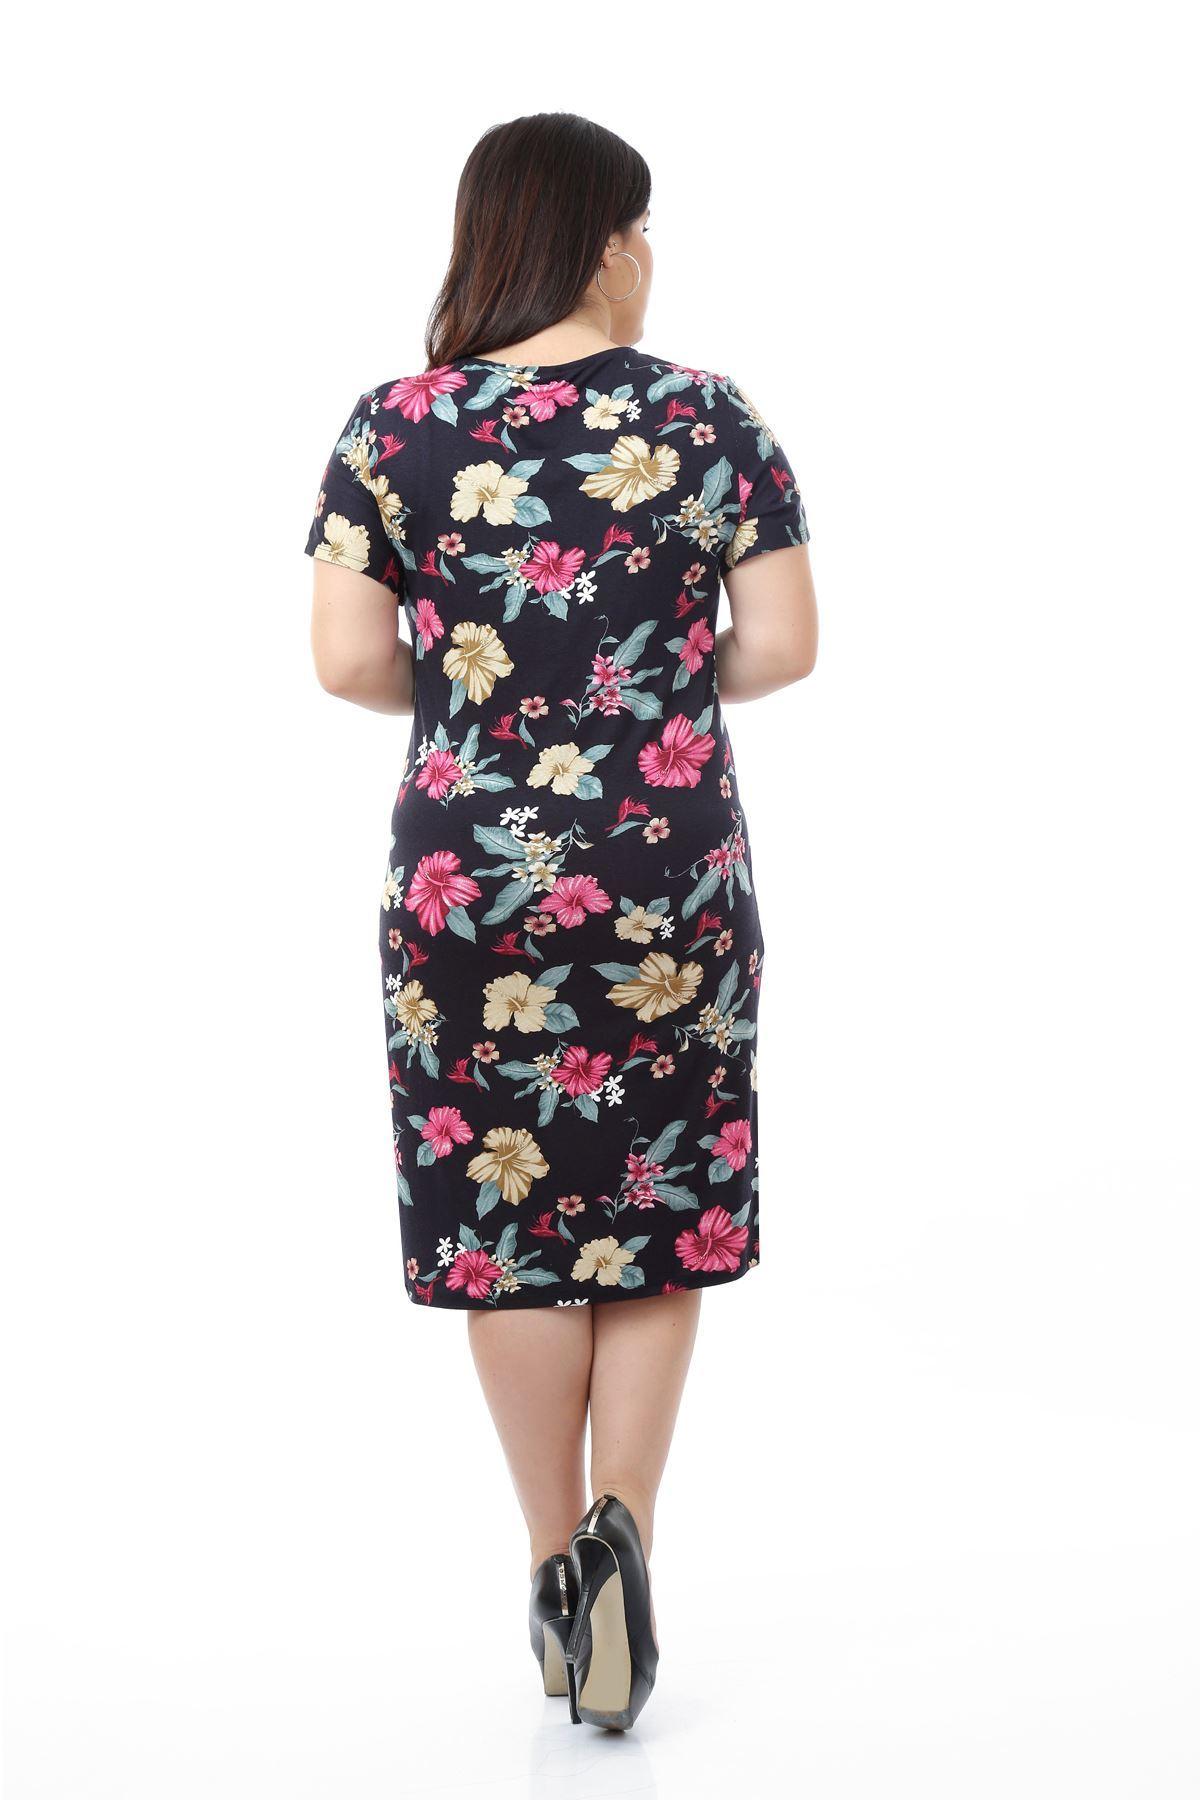 Lacivert Desenli Büyük Beden Elbise 5A-0665